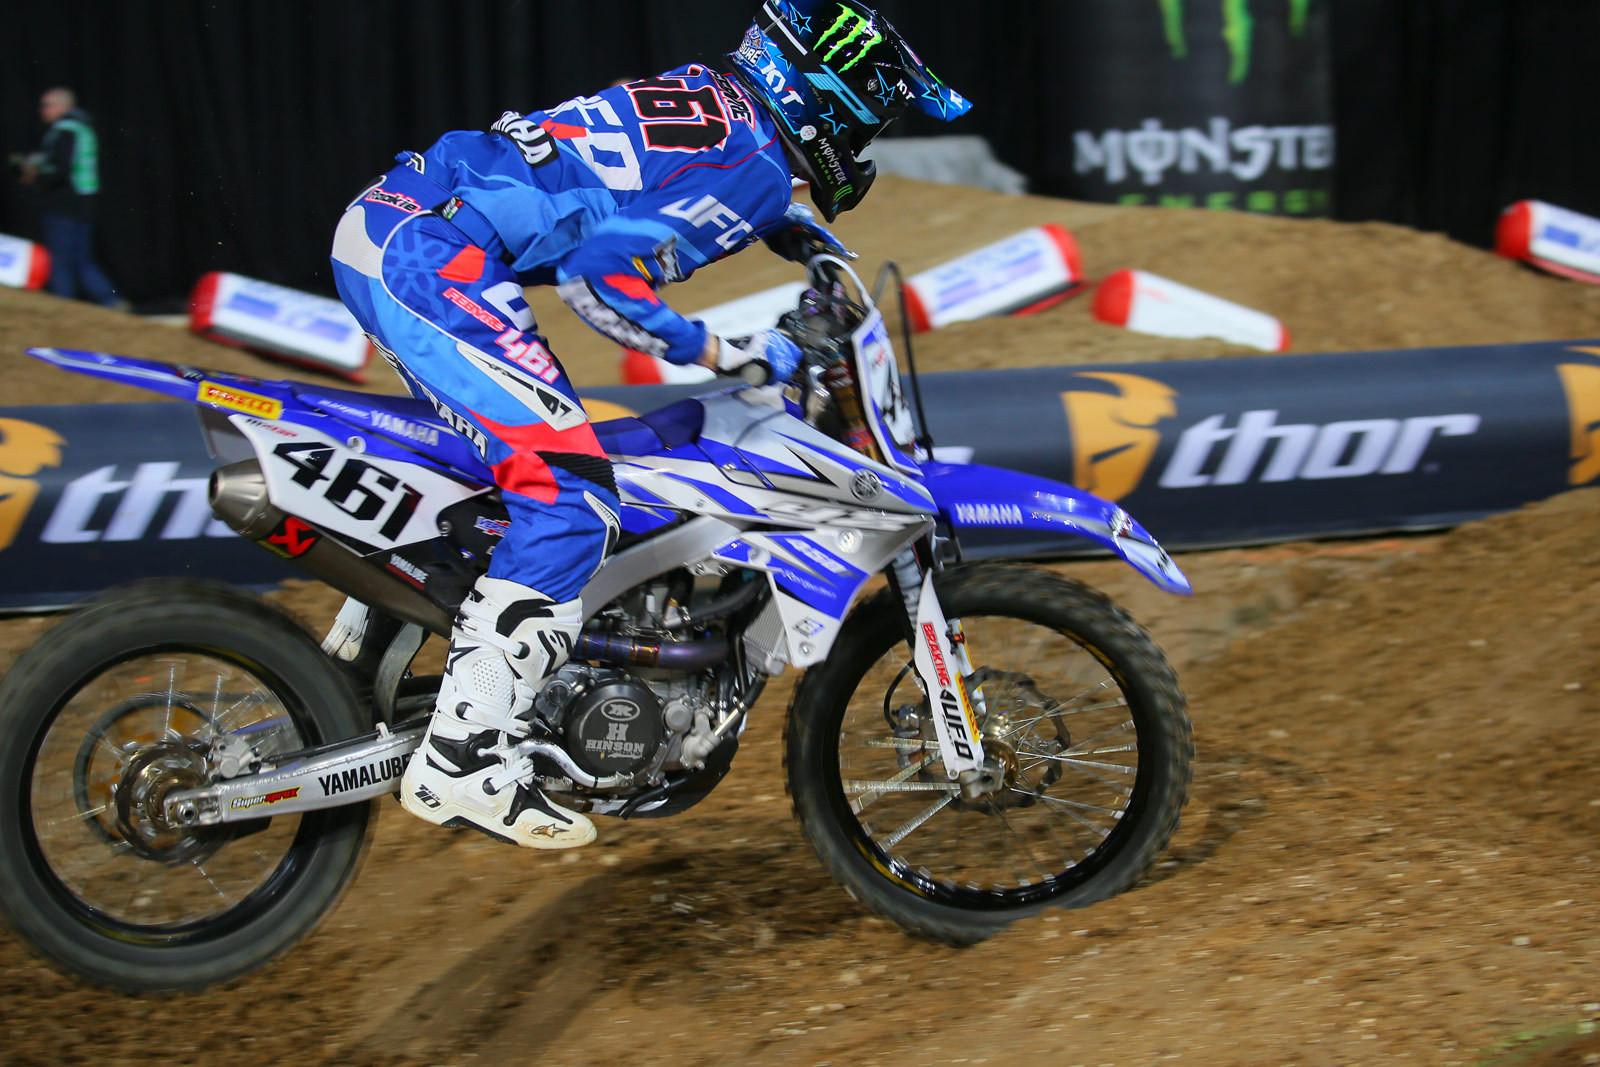 Romain Febvre - Vital MX Pit Bits: Paris-Lille Supercross - Motocross Pictures - Vital MX